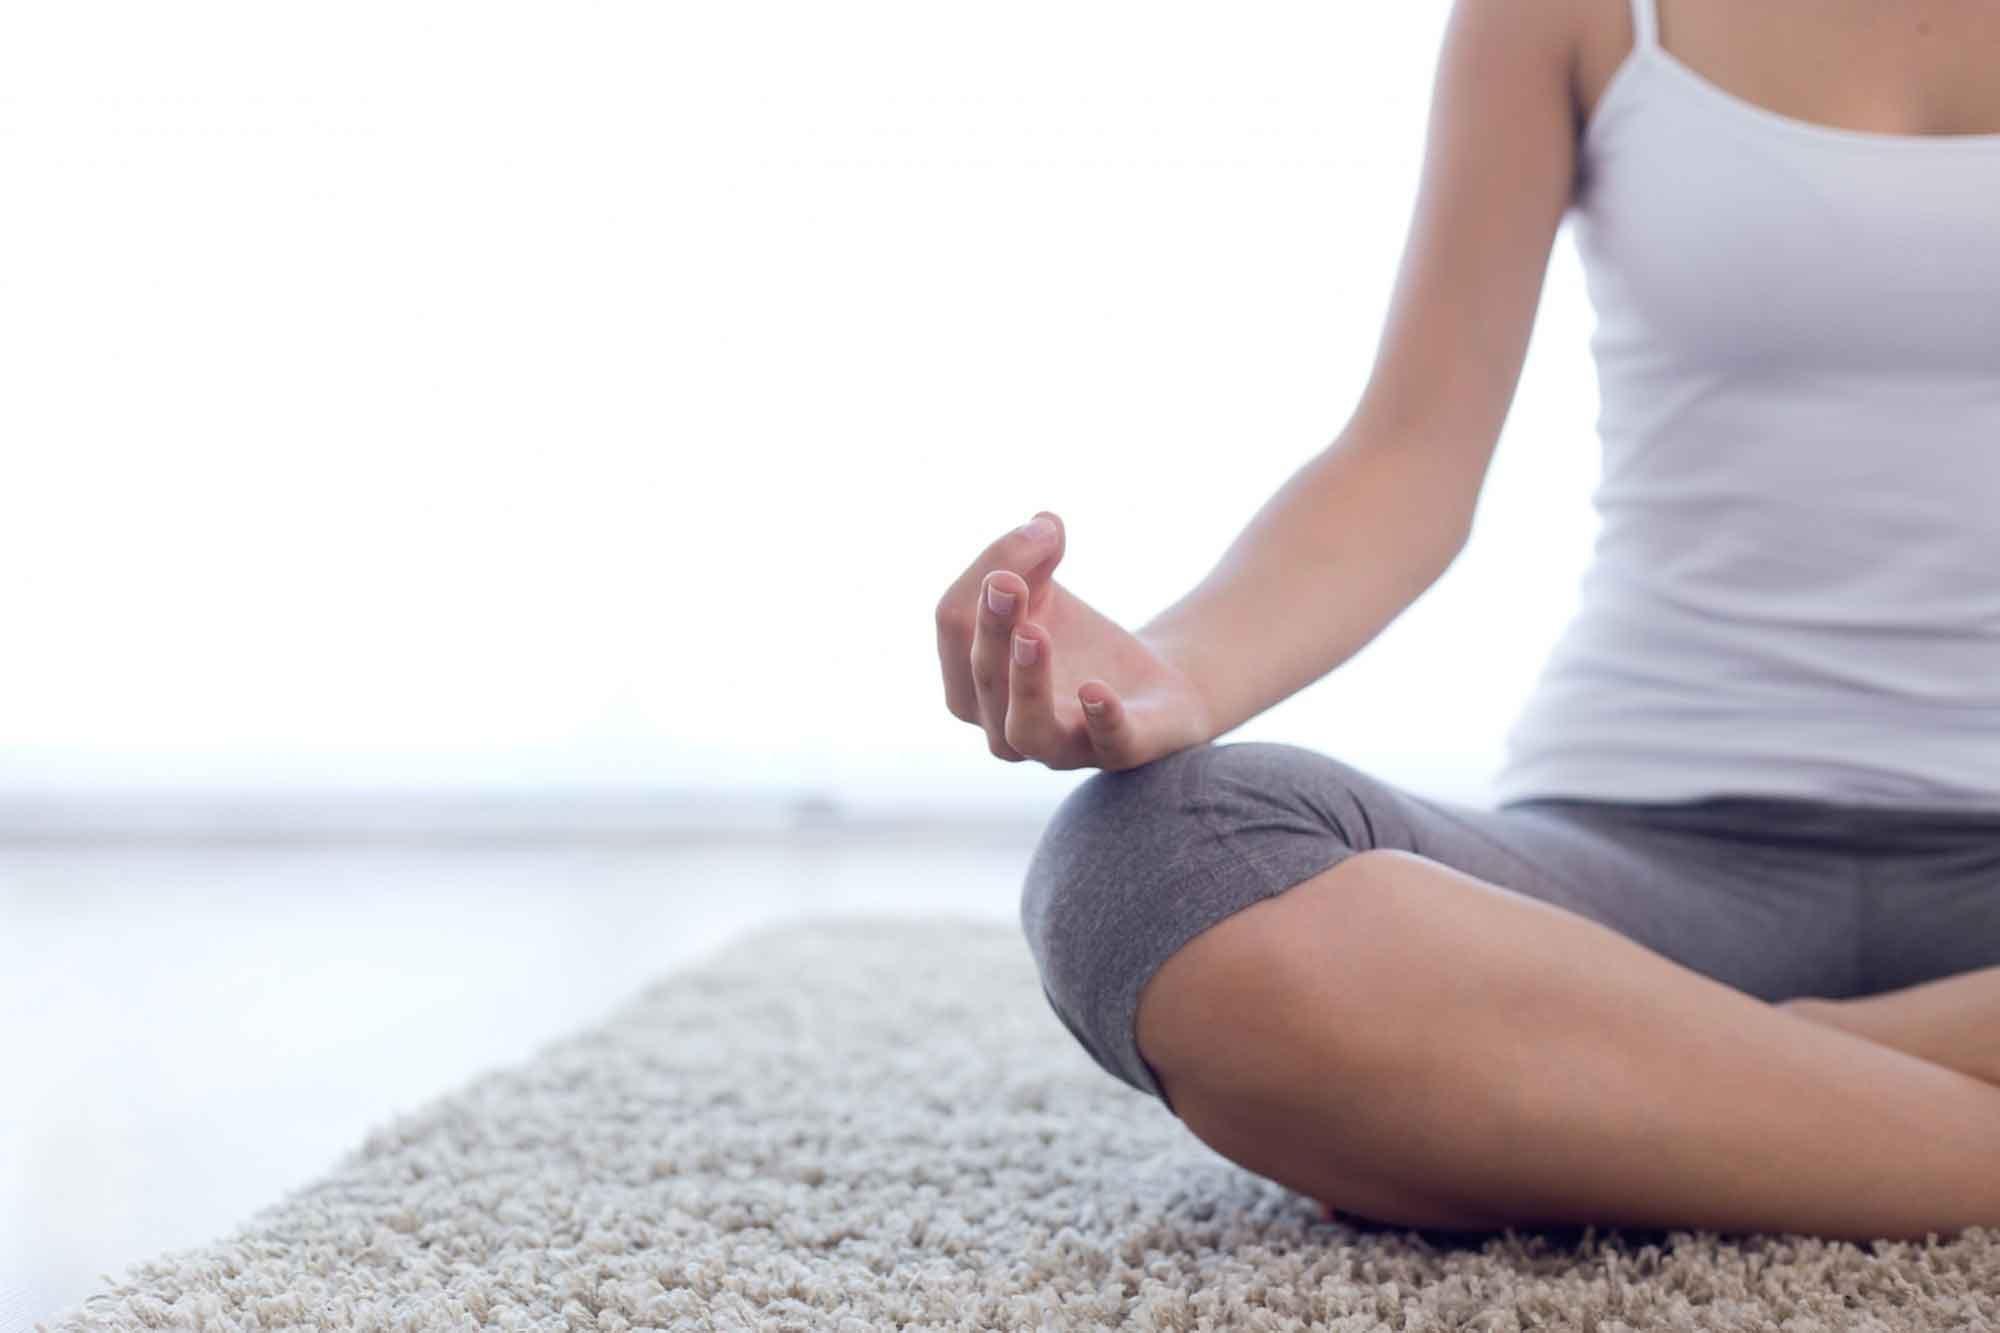 Des exercices adaptés existent contre le mal de dos